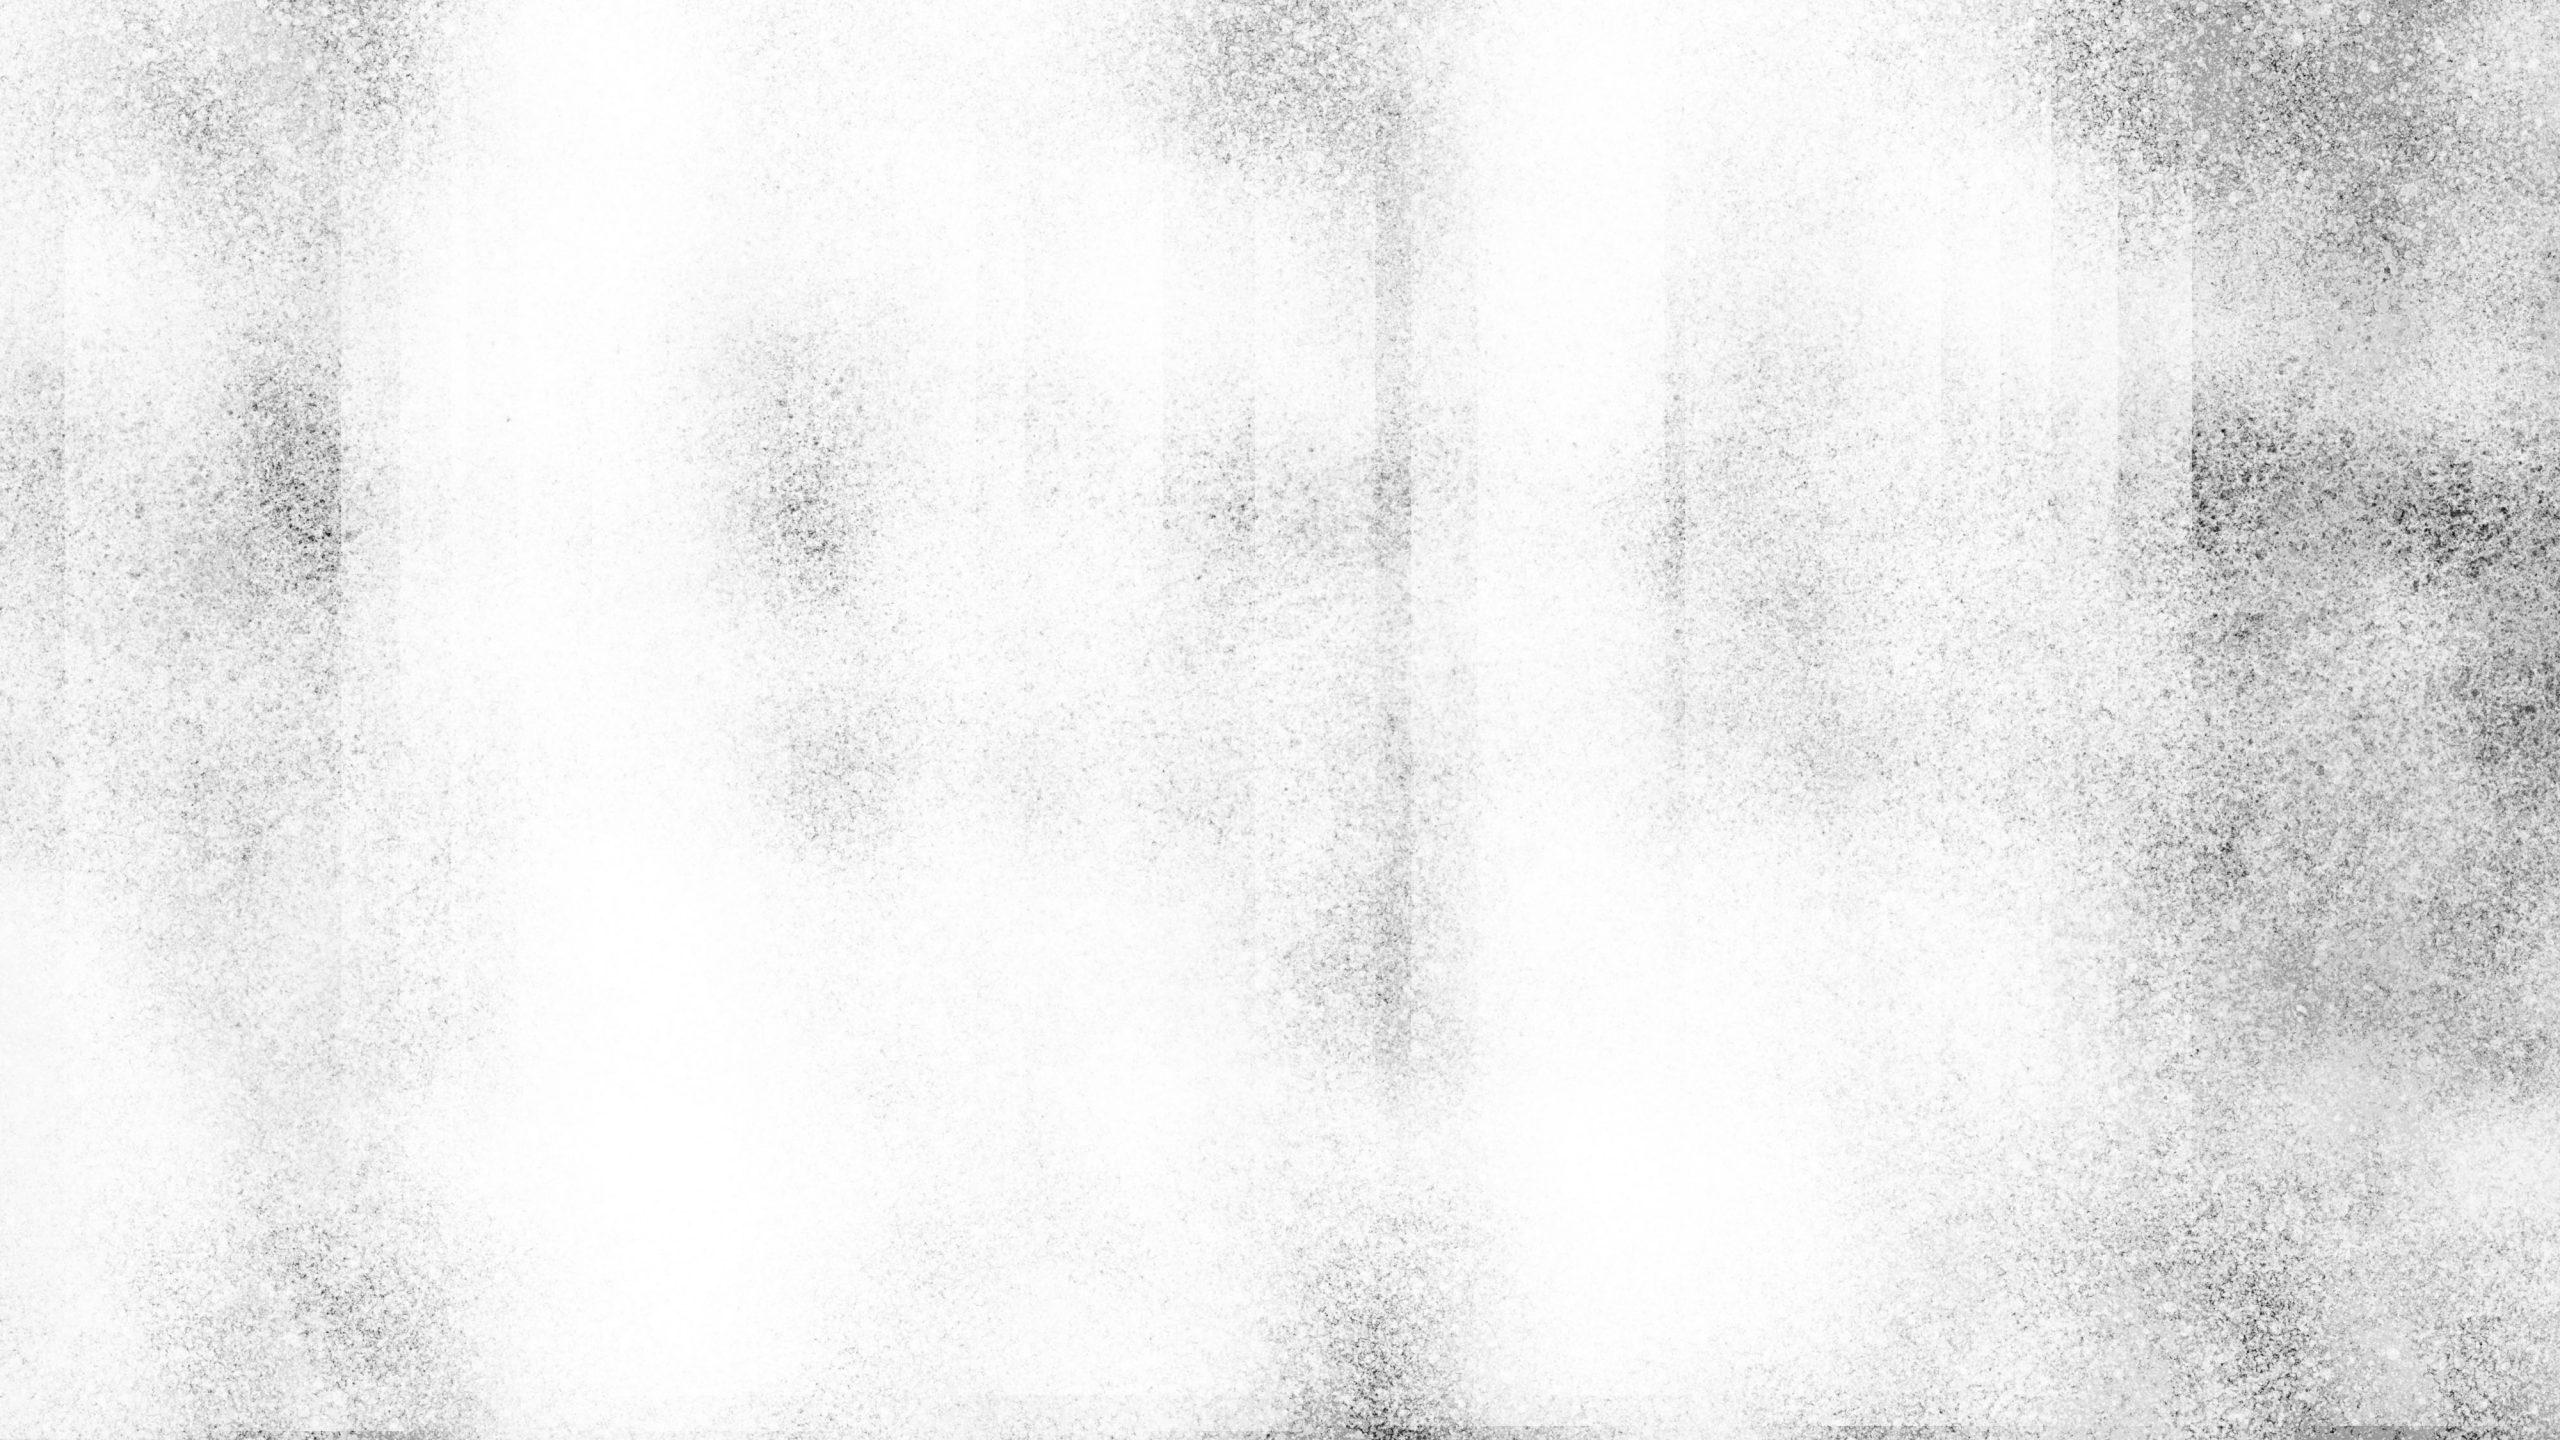 black-white-texture-background